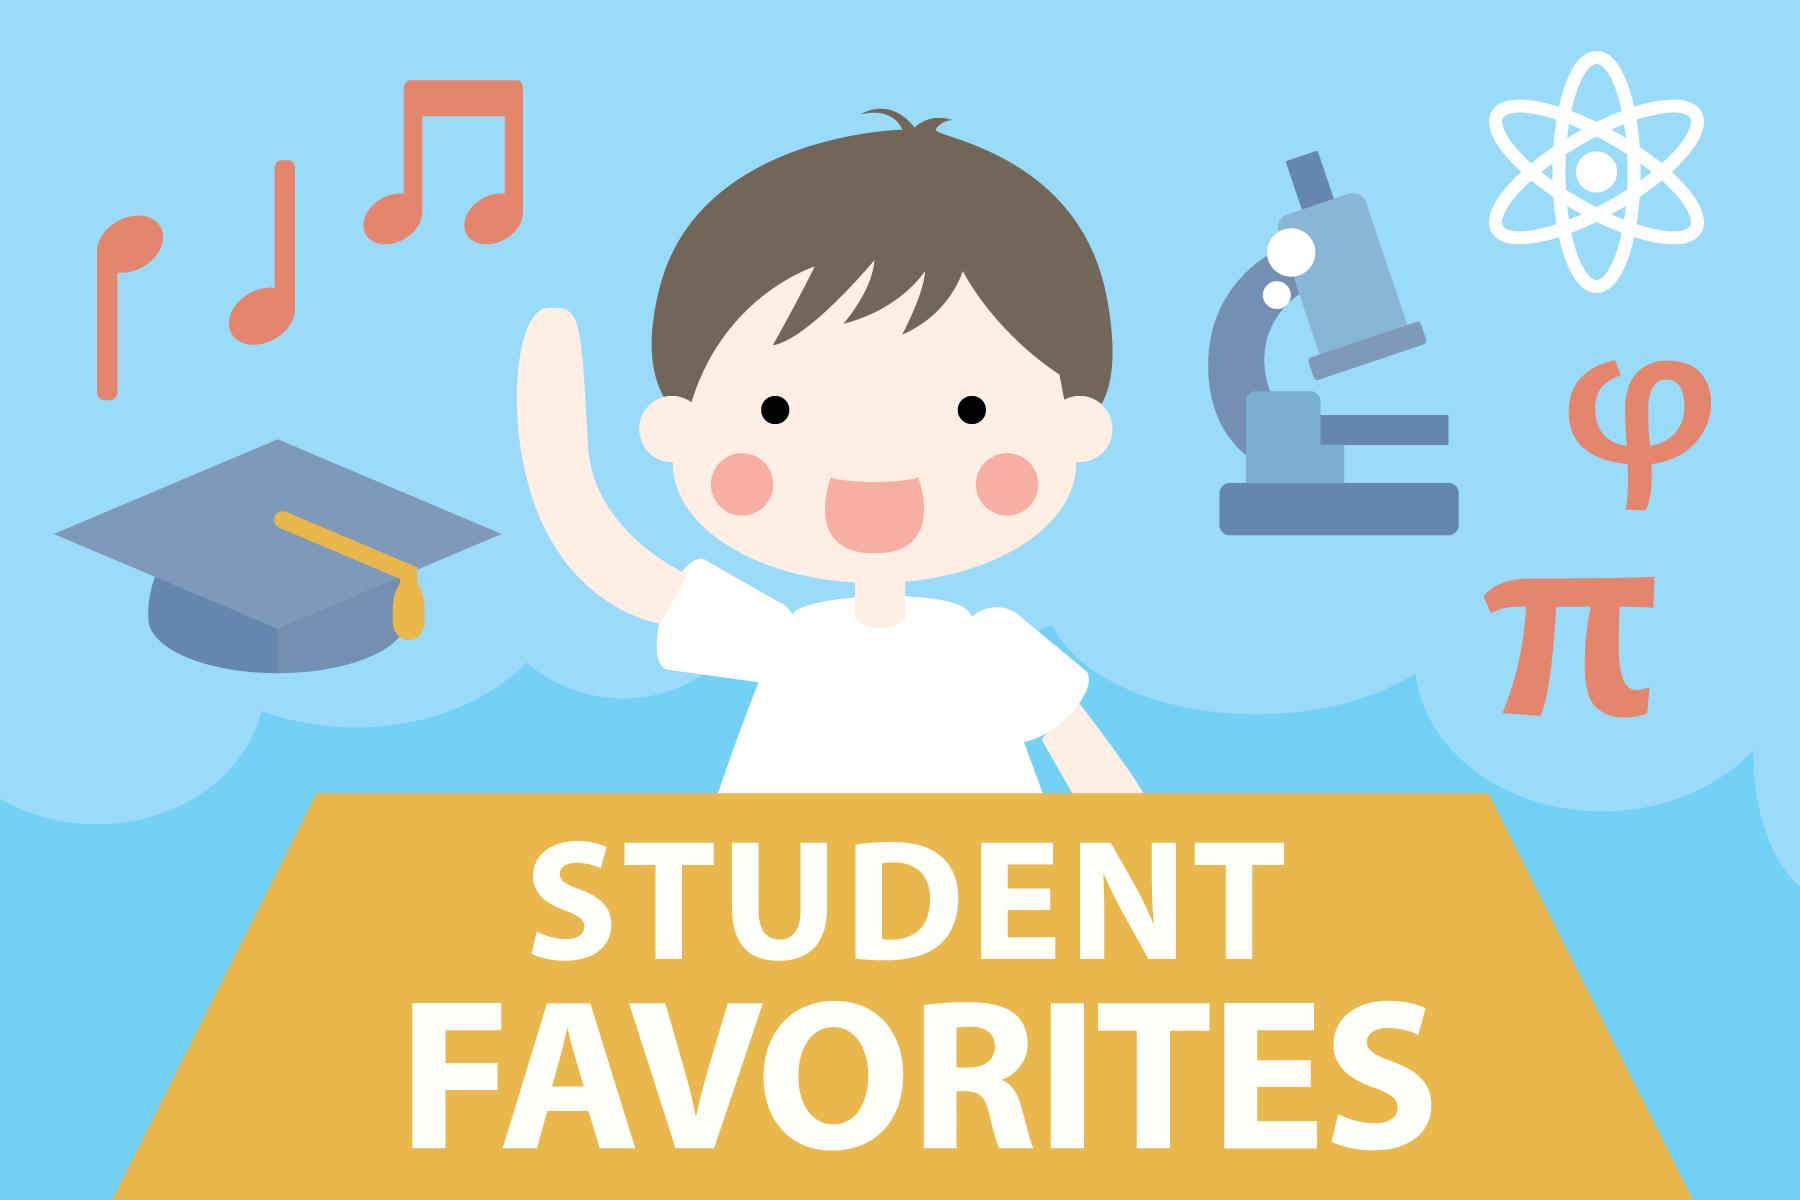 Student Favorites